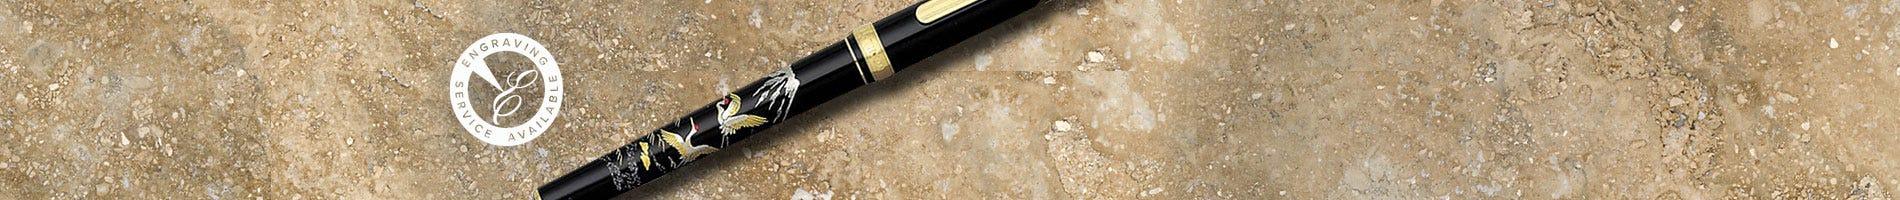 Platinum fountain pen decorated with Japanese Maki-e design